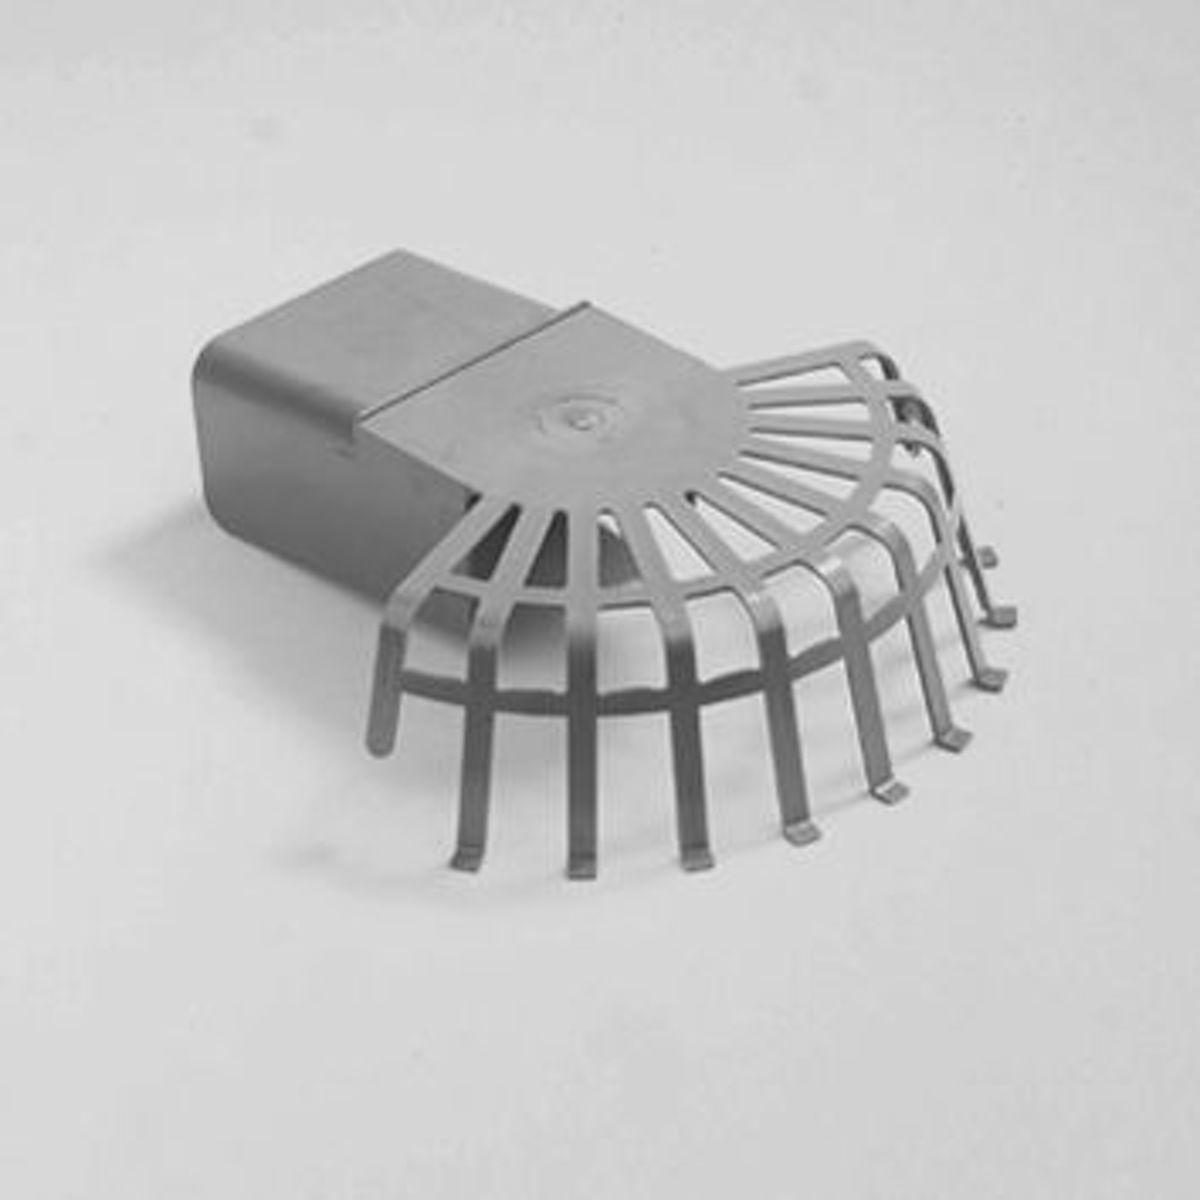 Dyka Bladvanger PVC grijs 60 x 100mm (Prijs per stuk) kopen